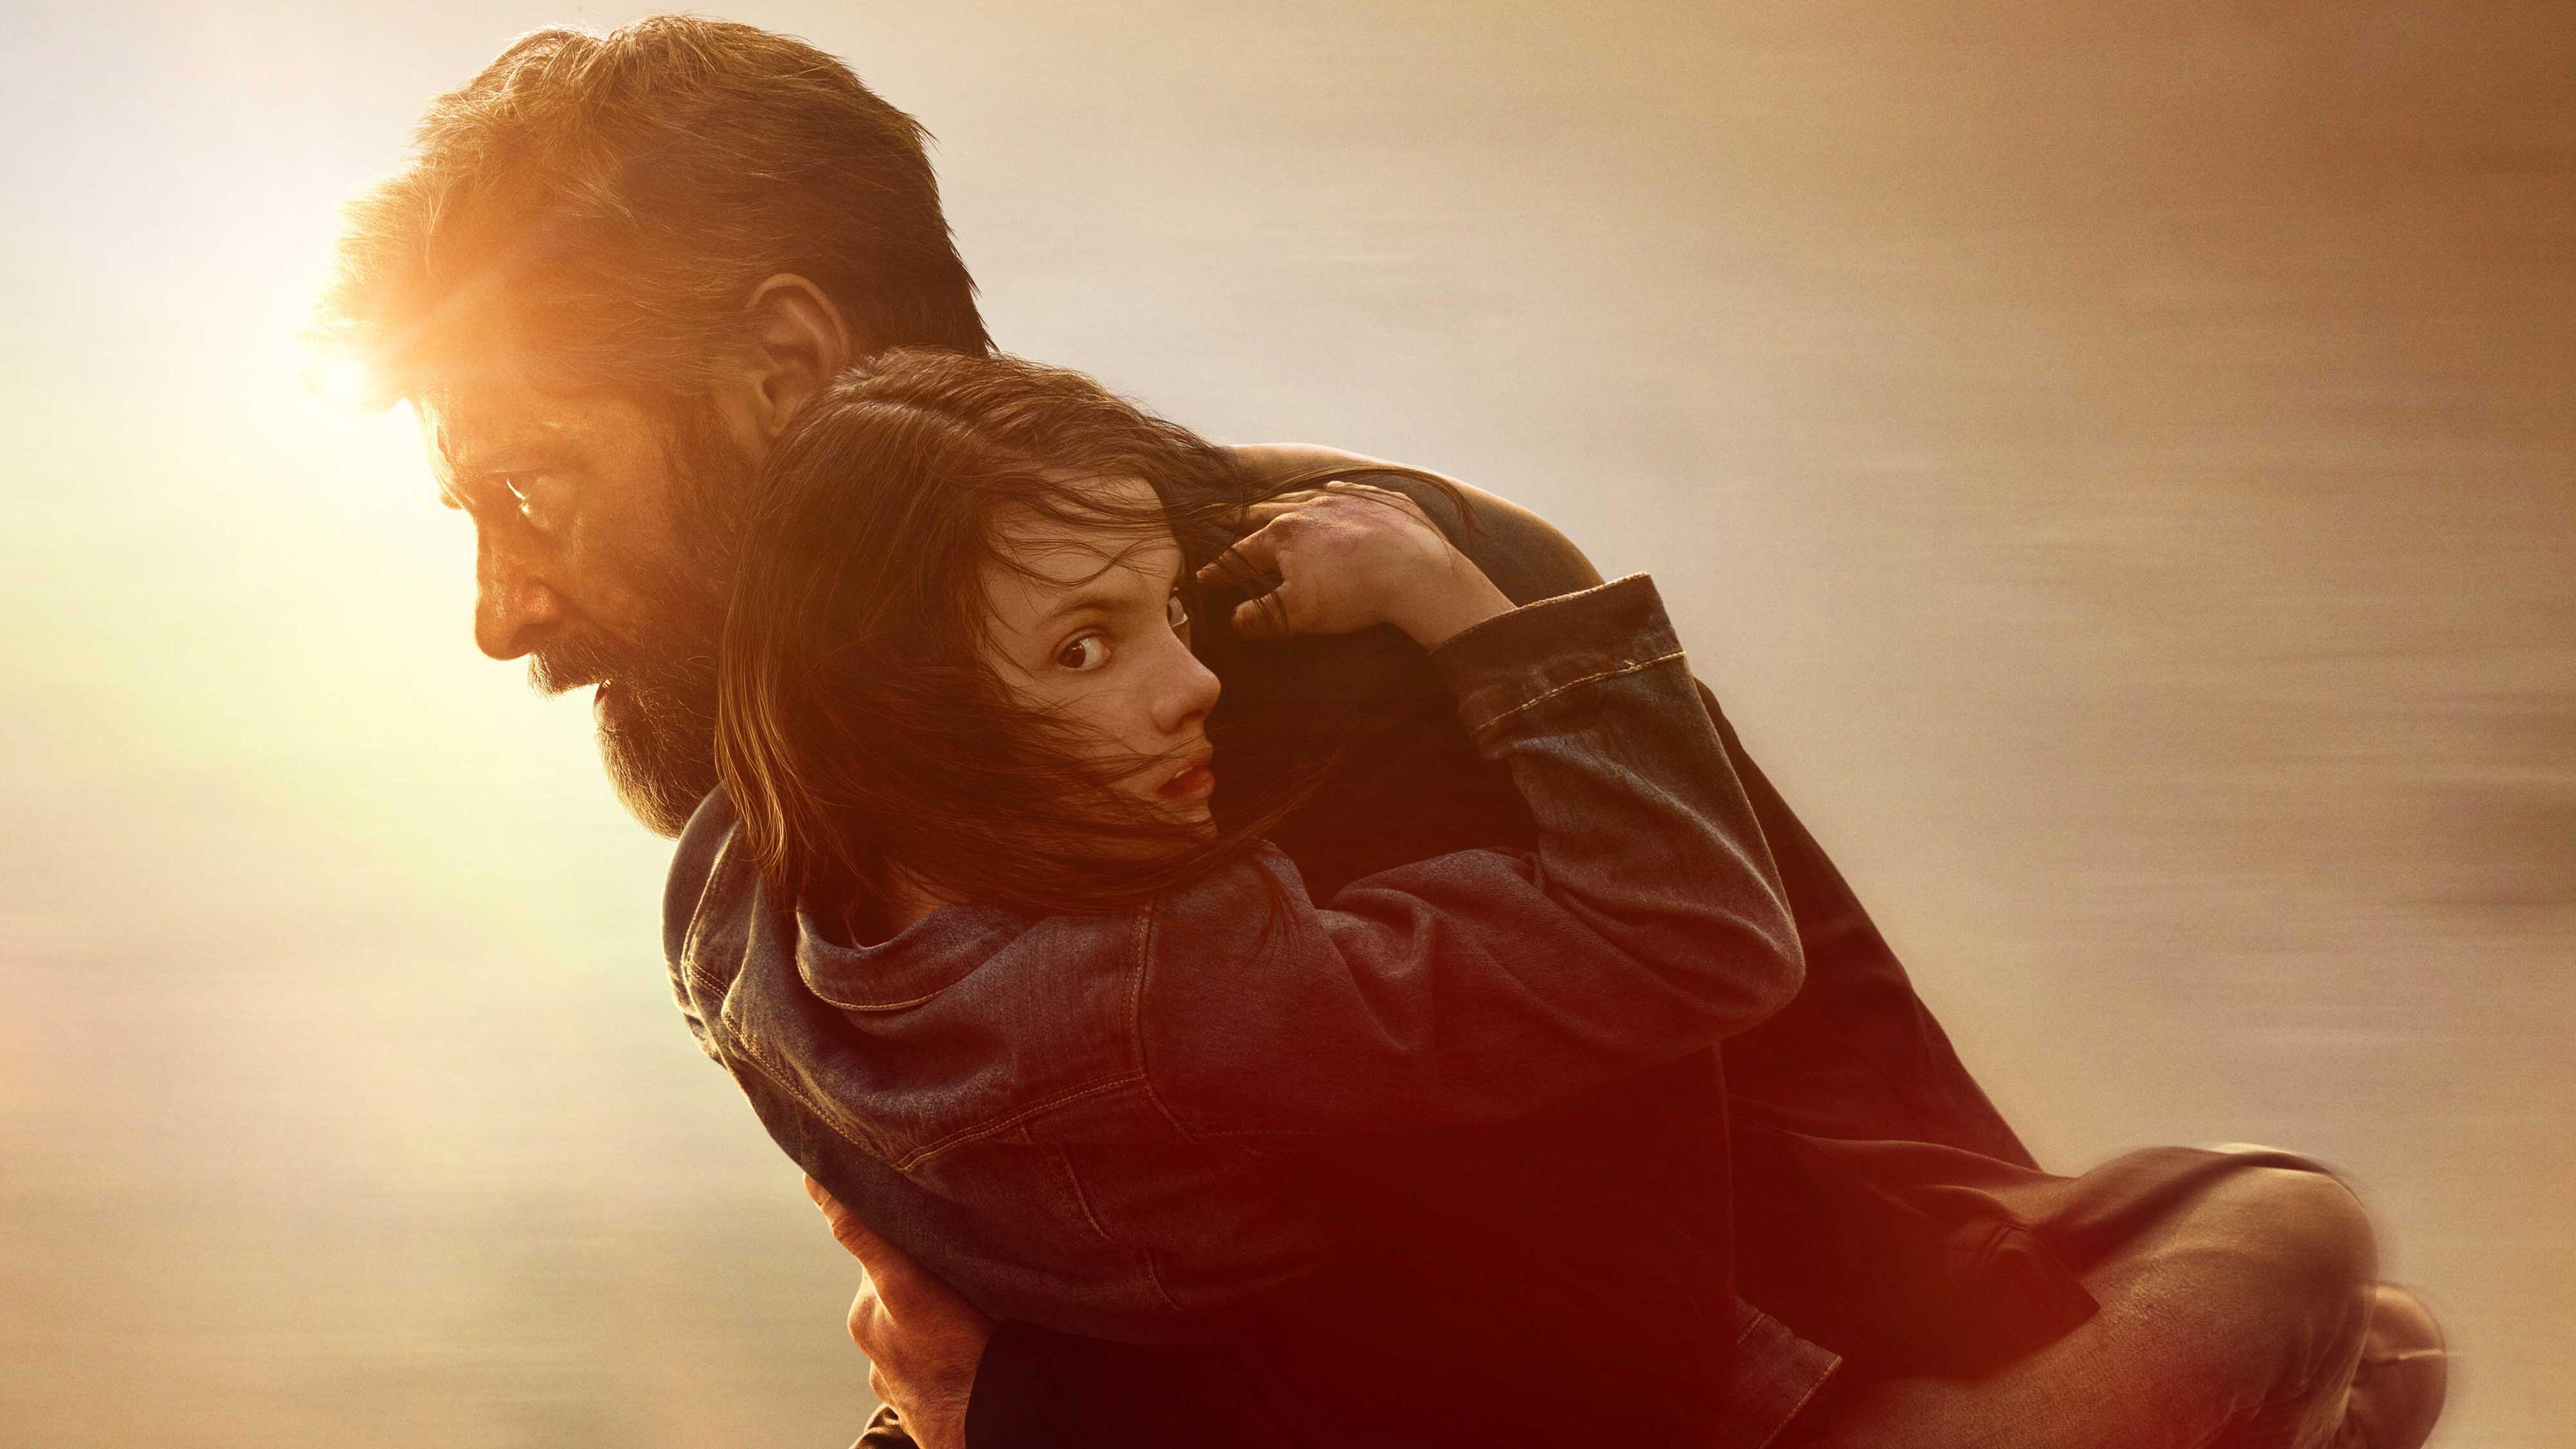 Logan 2017 Movie 5K - This HD wallpaper is based on Logan N/A. It ...